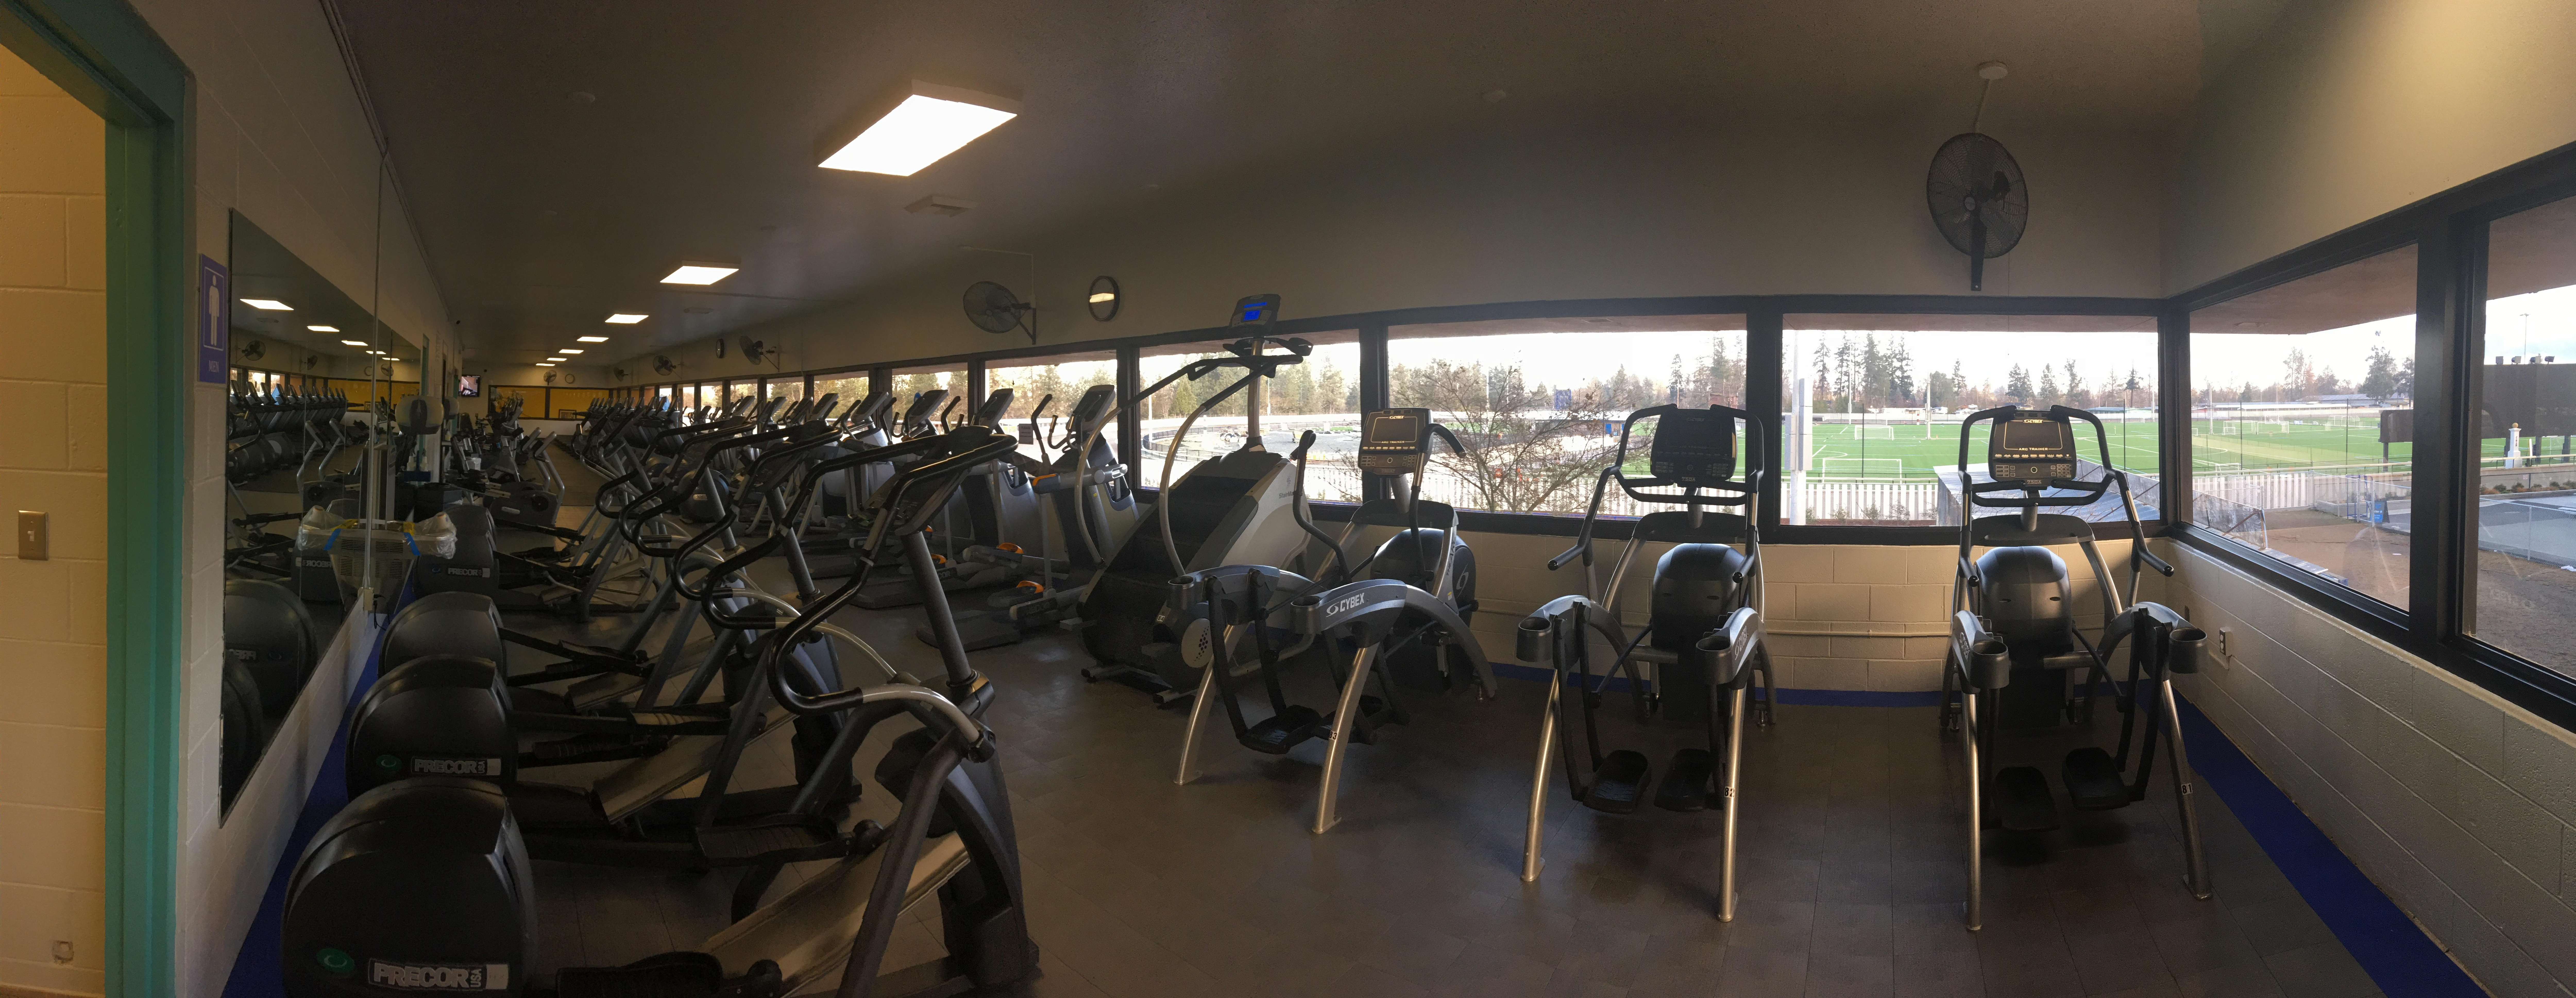 Cardio Room East